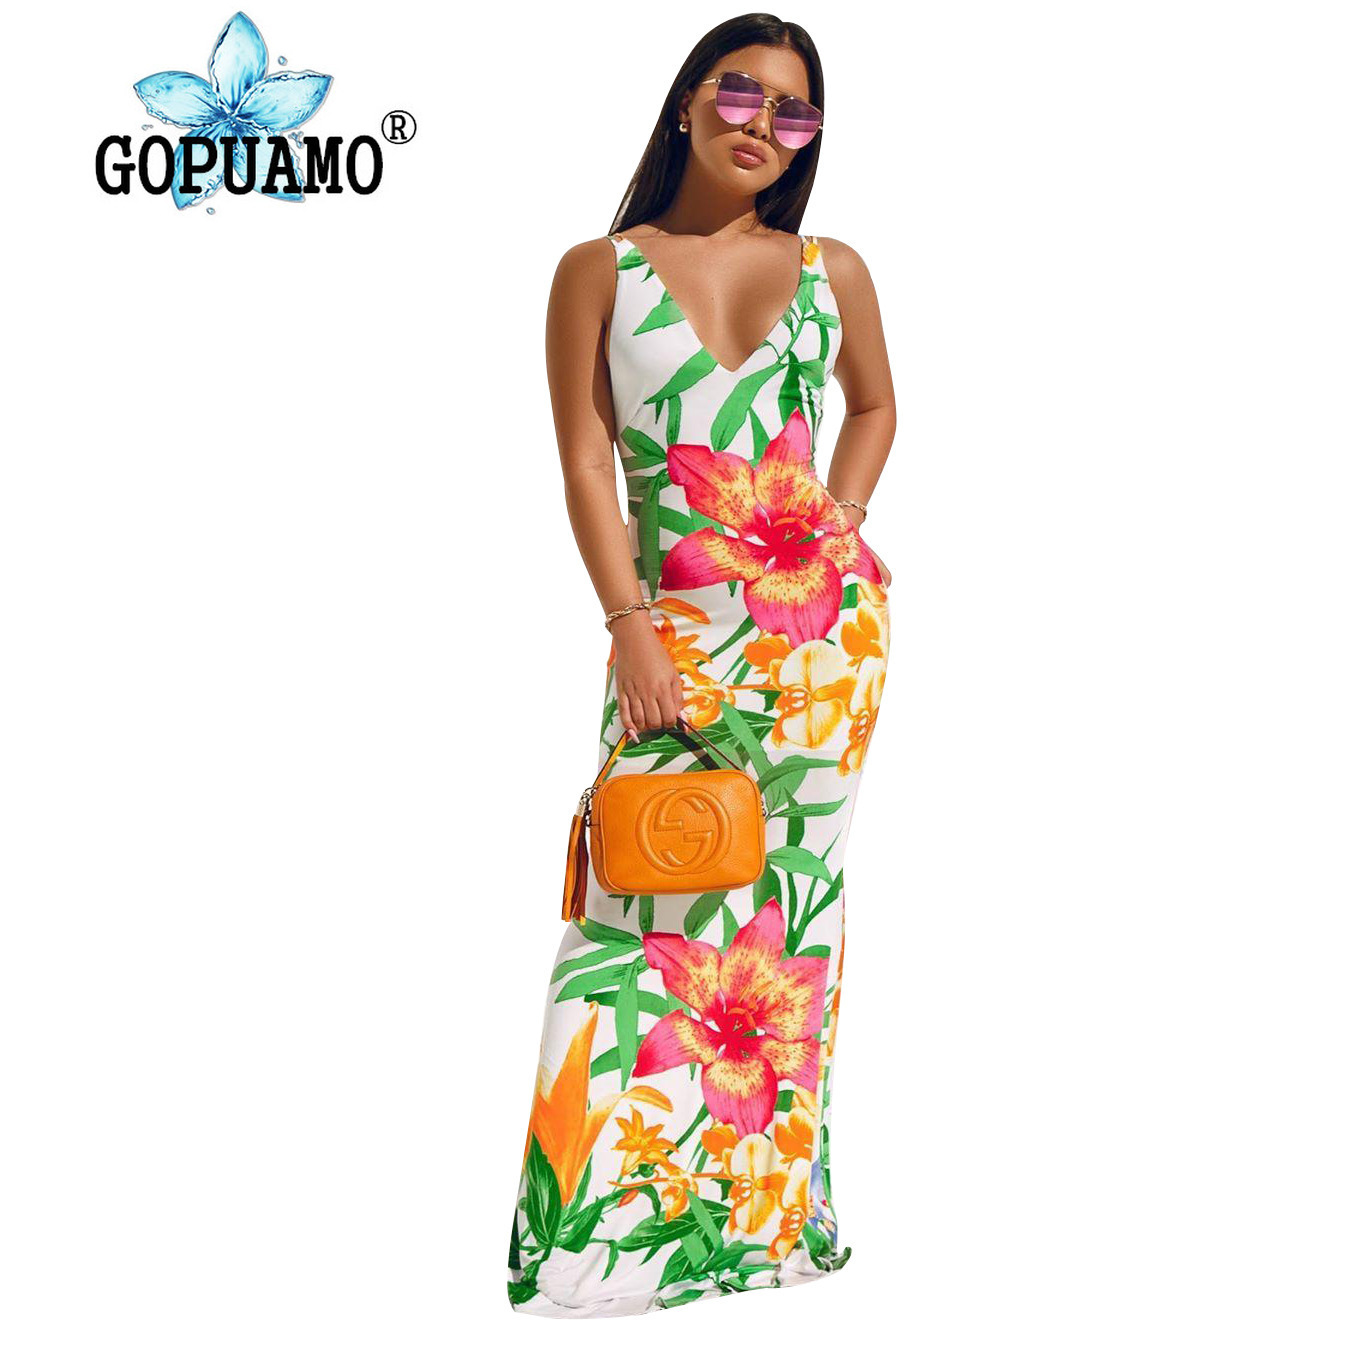 Floral Printed Summer Beach Boho Dress Women Deep V Neck Sleeveless Bodycon Long Dress Vintage High Waist Backless Party20190529